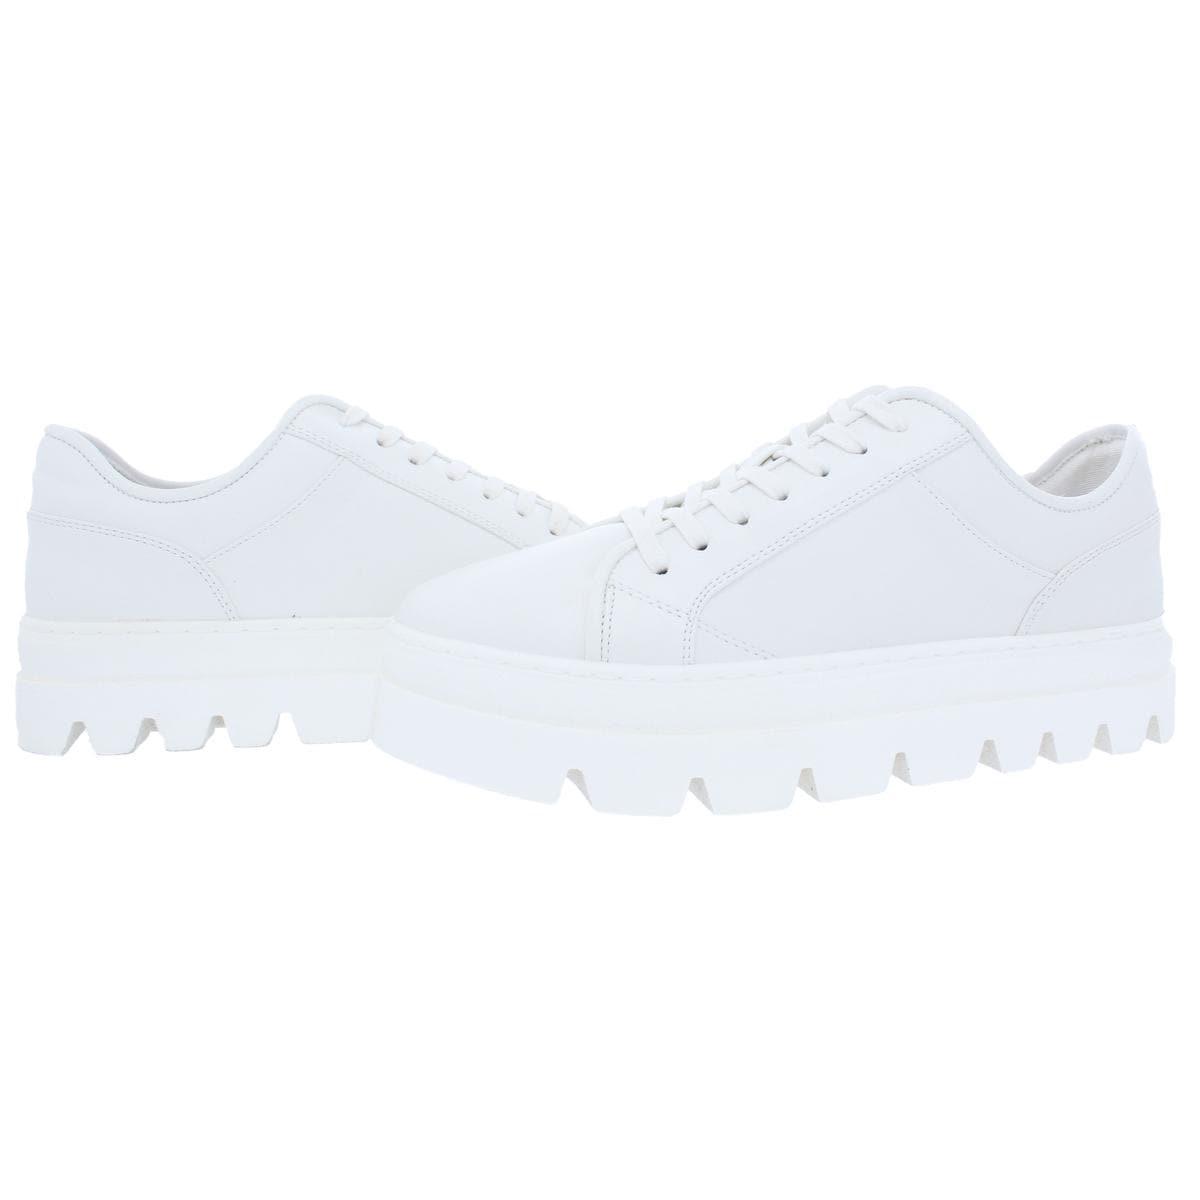 8c2b28491e3 Steve Madden Womens Kickstart Fashion Sneakers Contrast Trim Platform